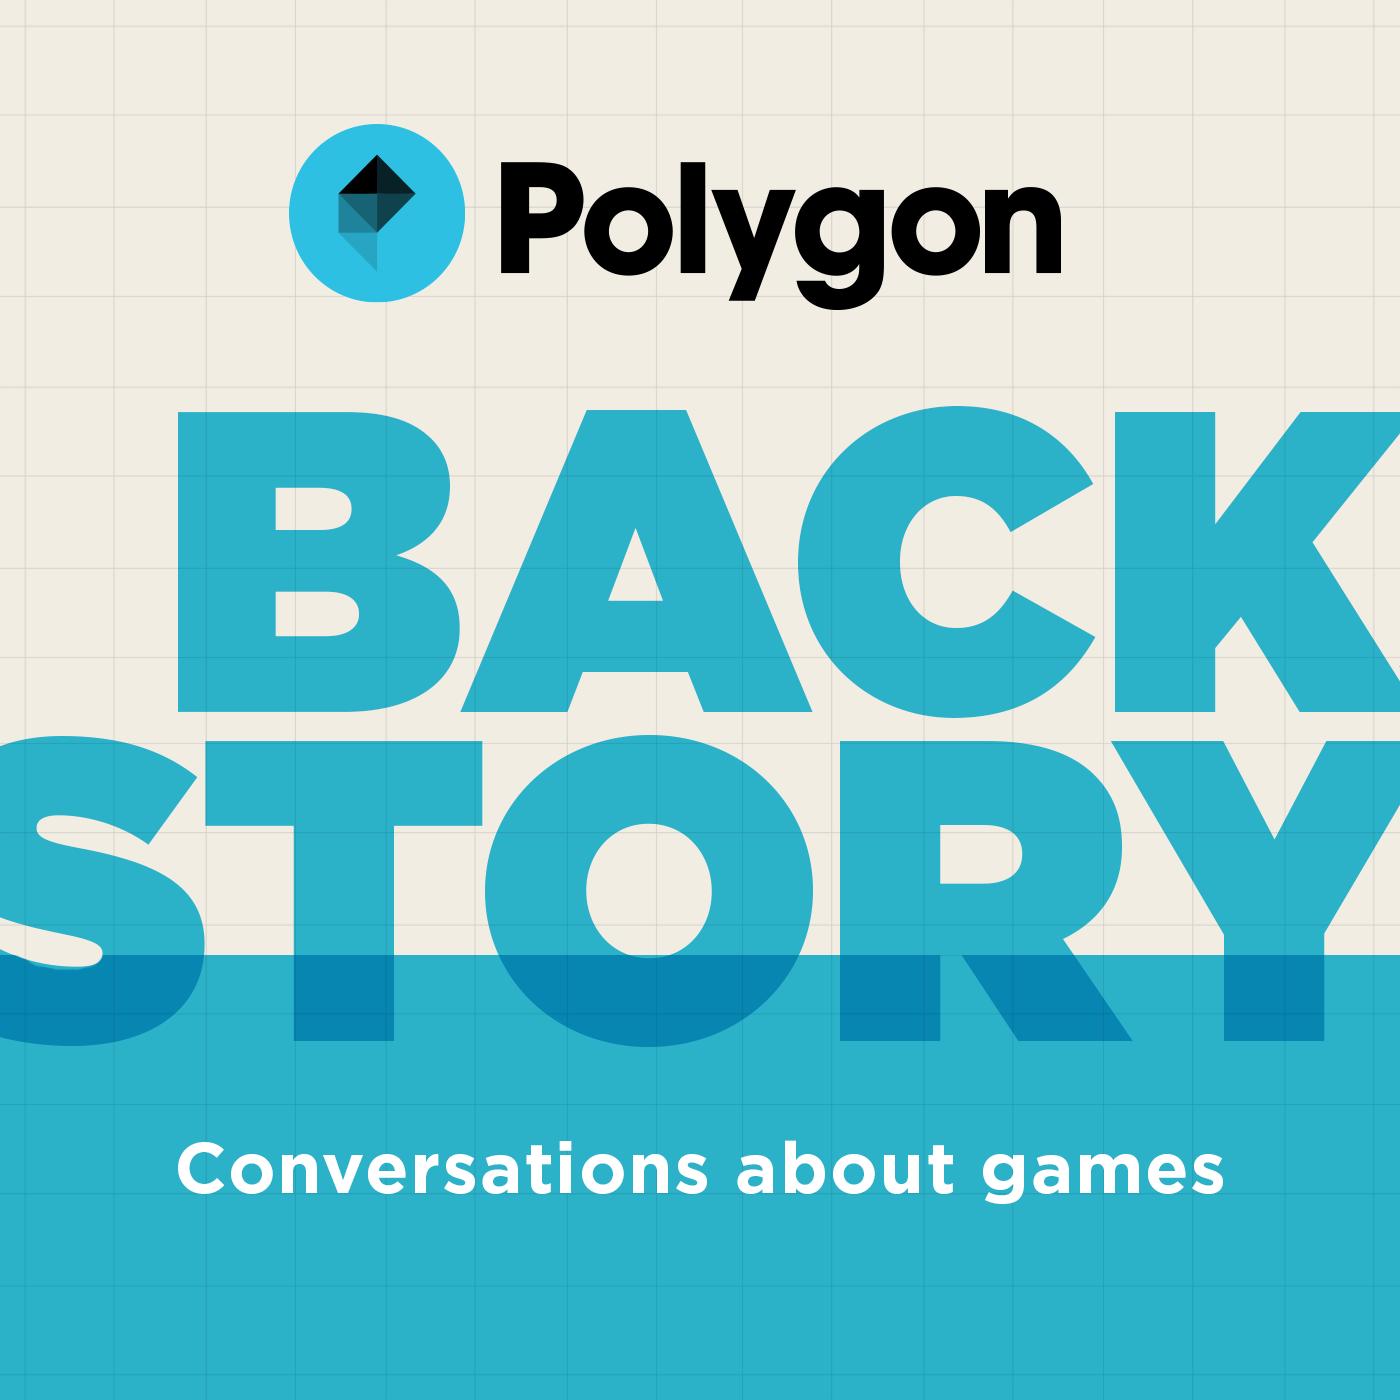 Polygon Backstory